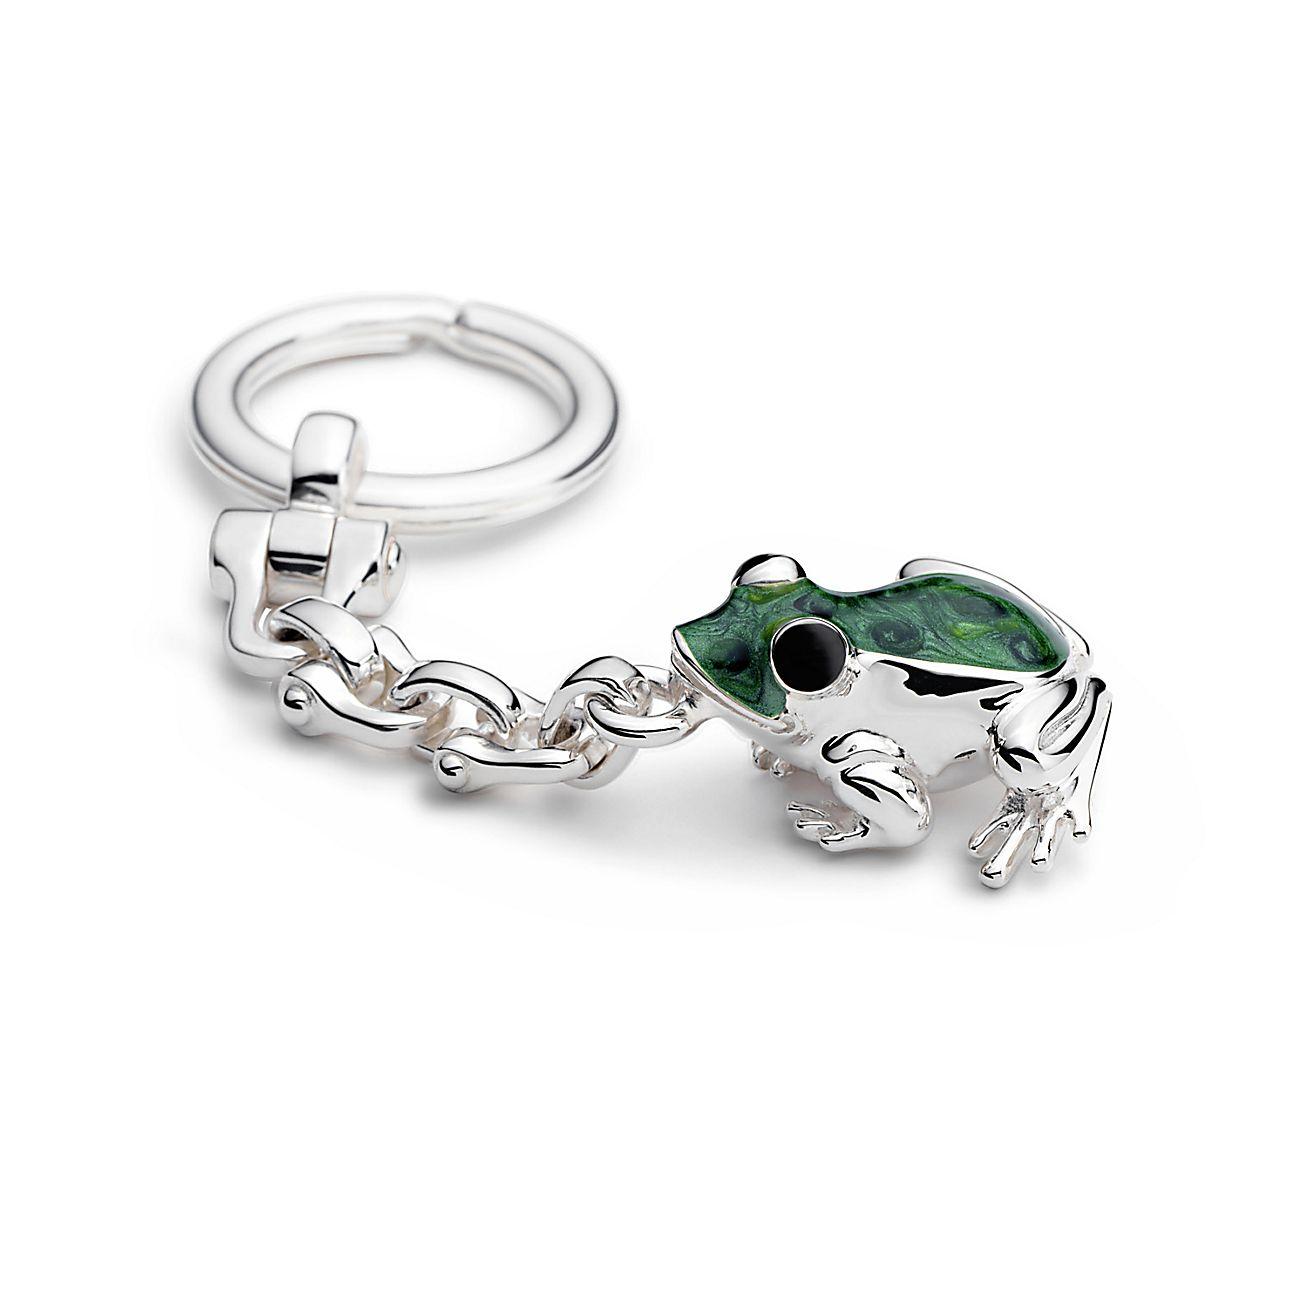 Frog Engagment Rings